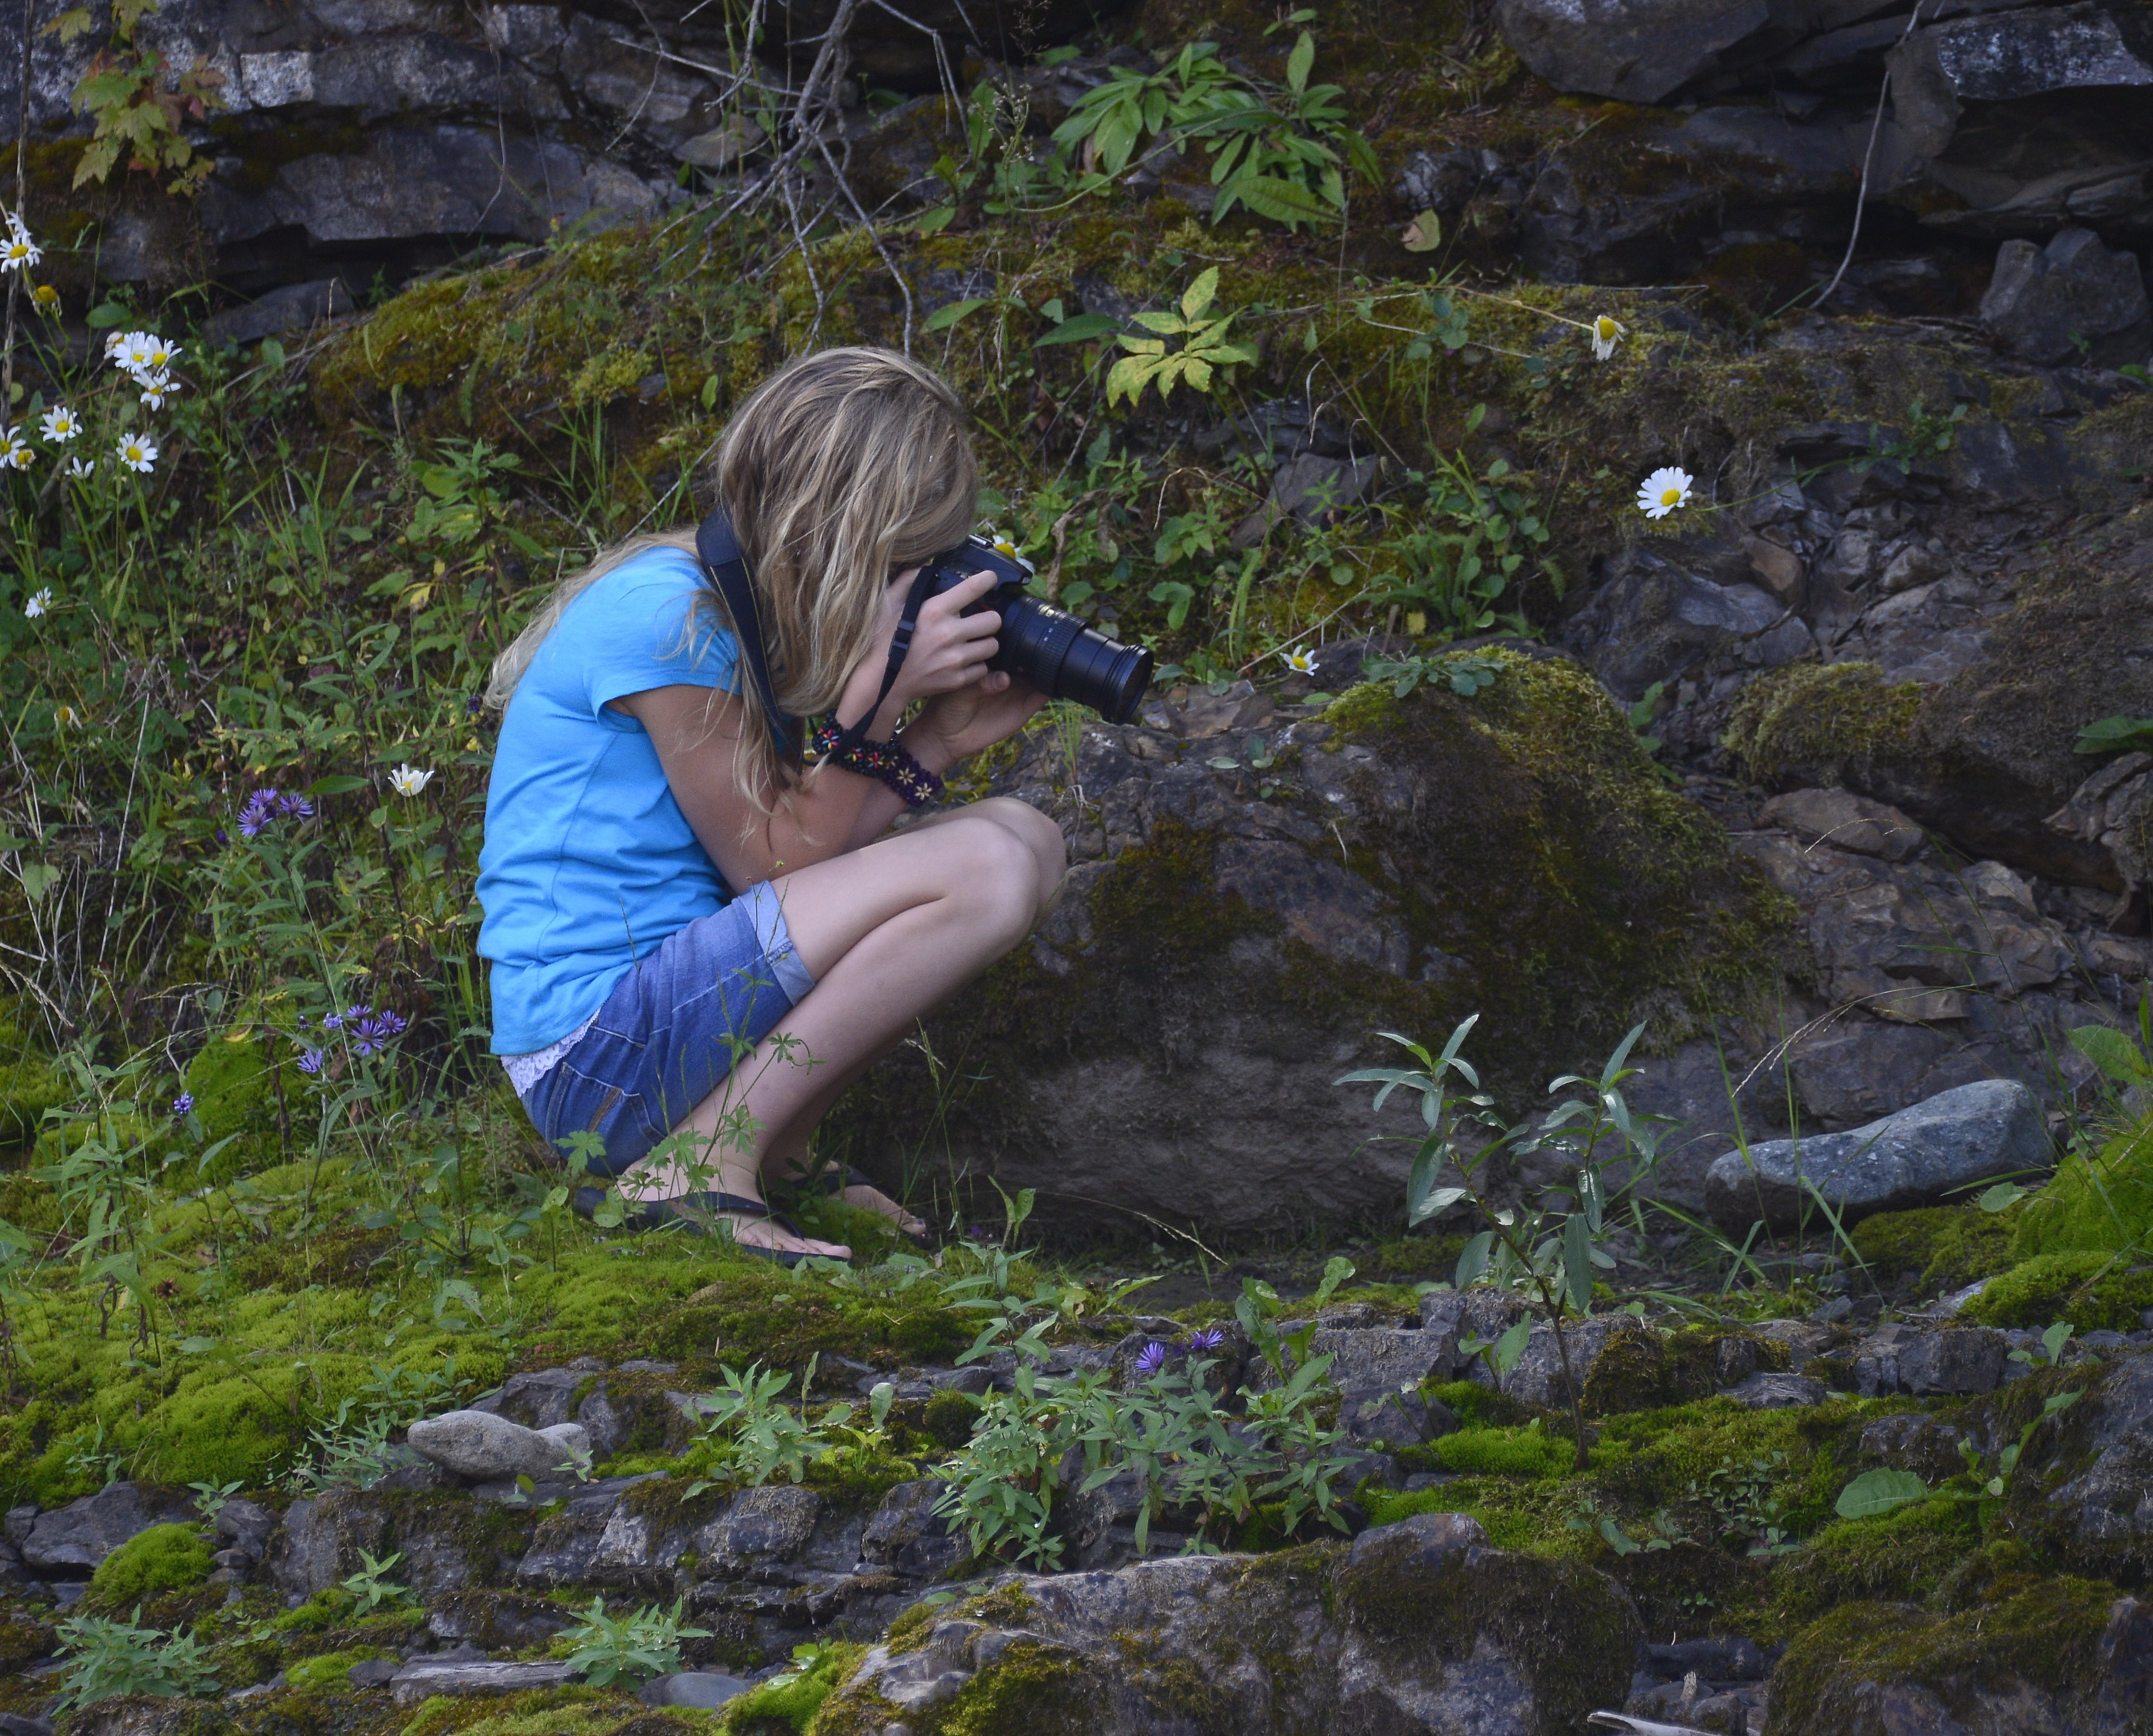 child s view of moss garden